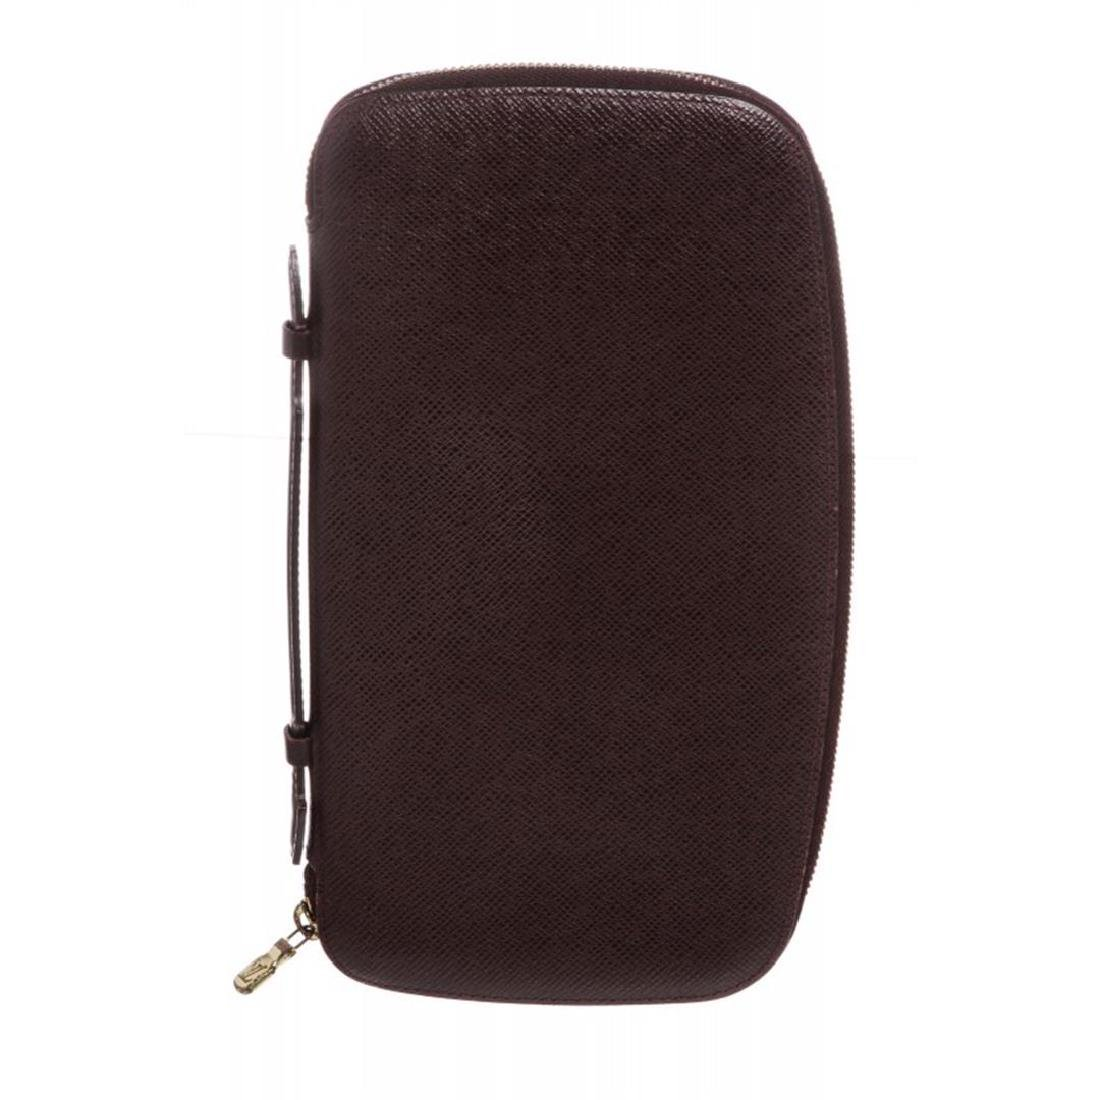 Louis Vuitton Burgundy Taiga Leather Geode Organizer